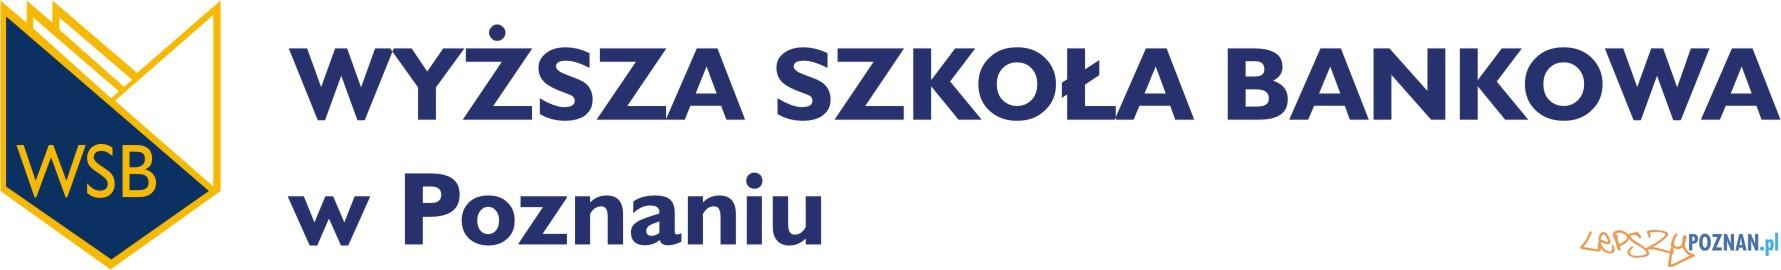 WSB logo  Foto: WSB